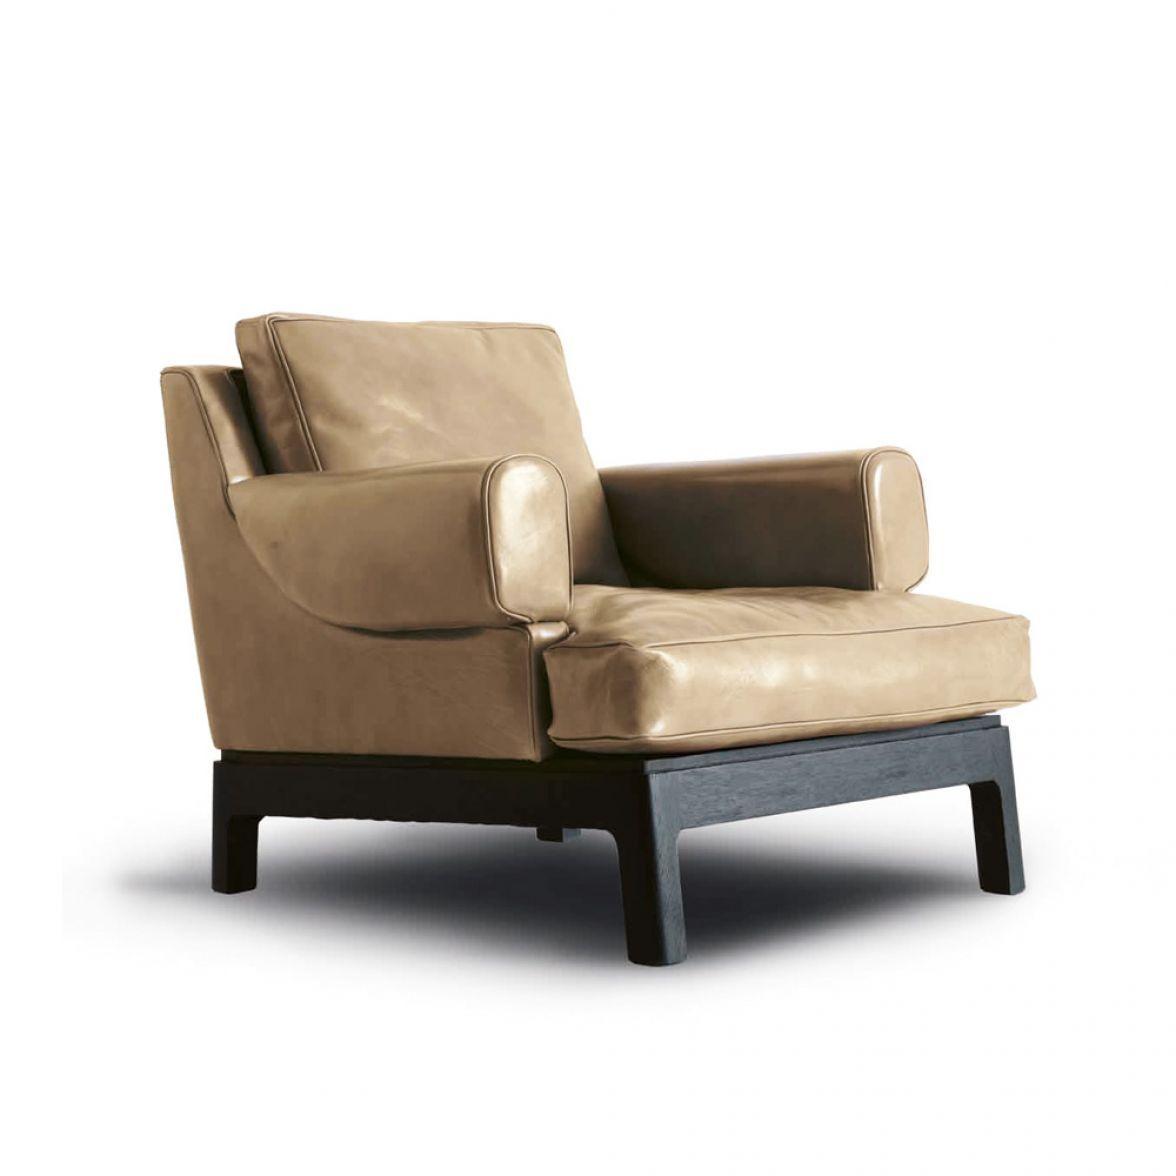 Taylor armchair фото цена